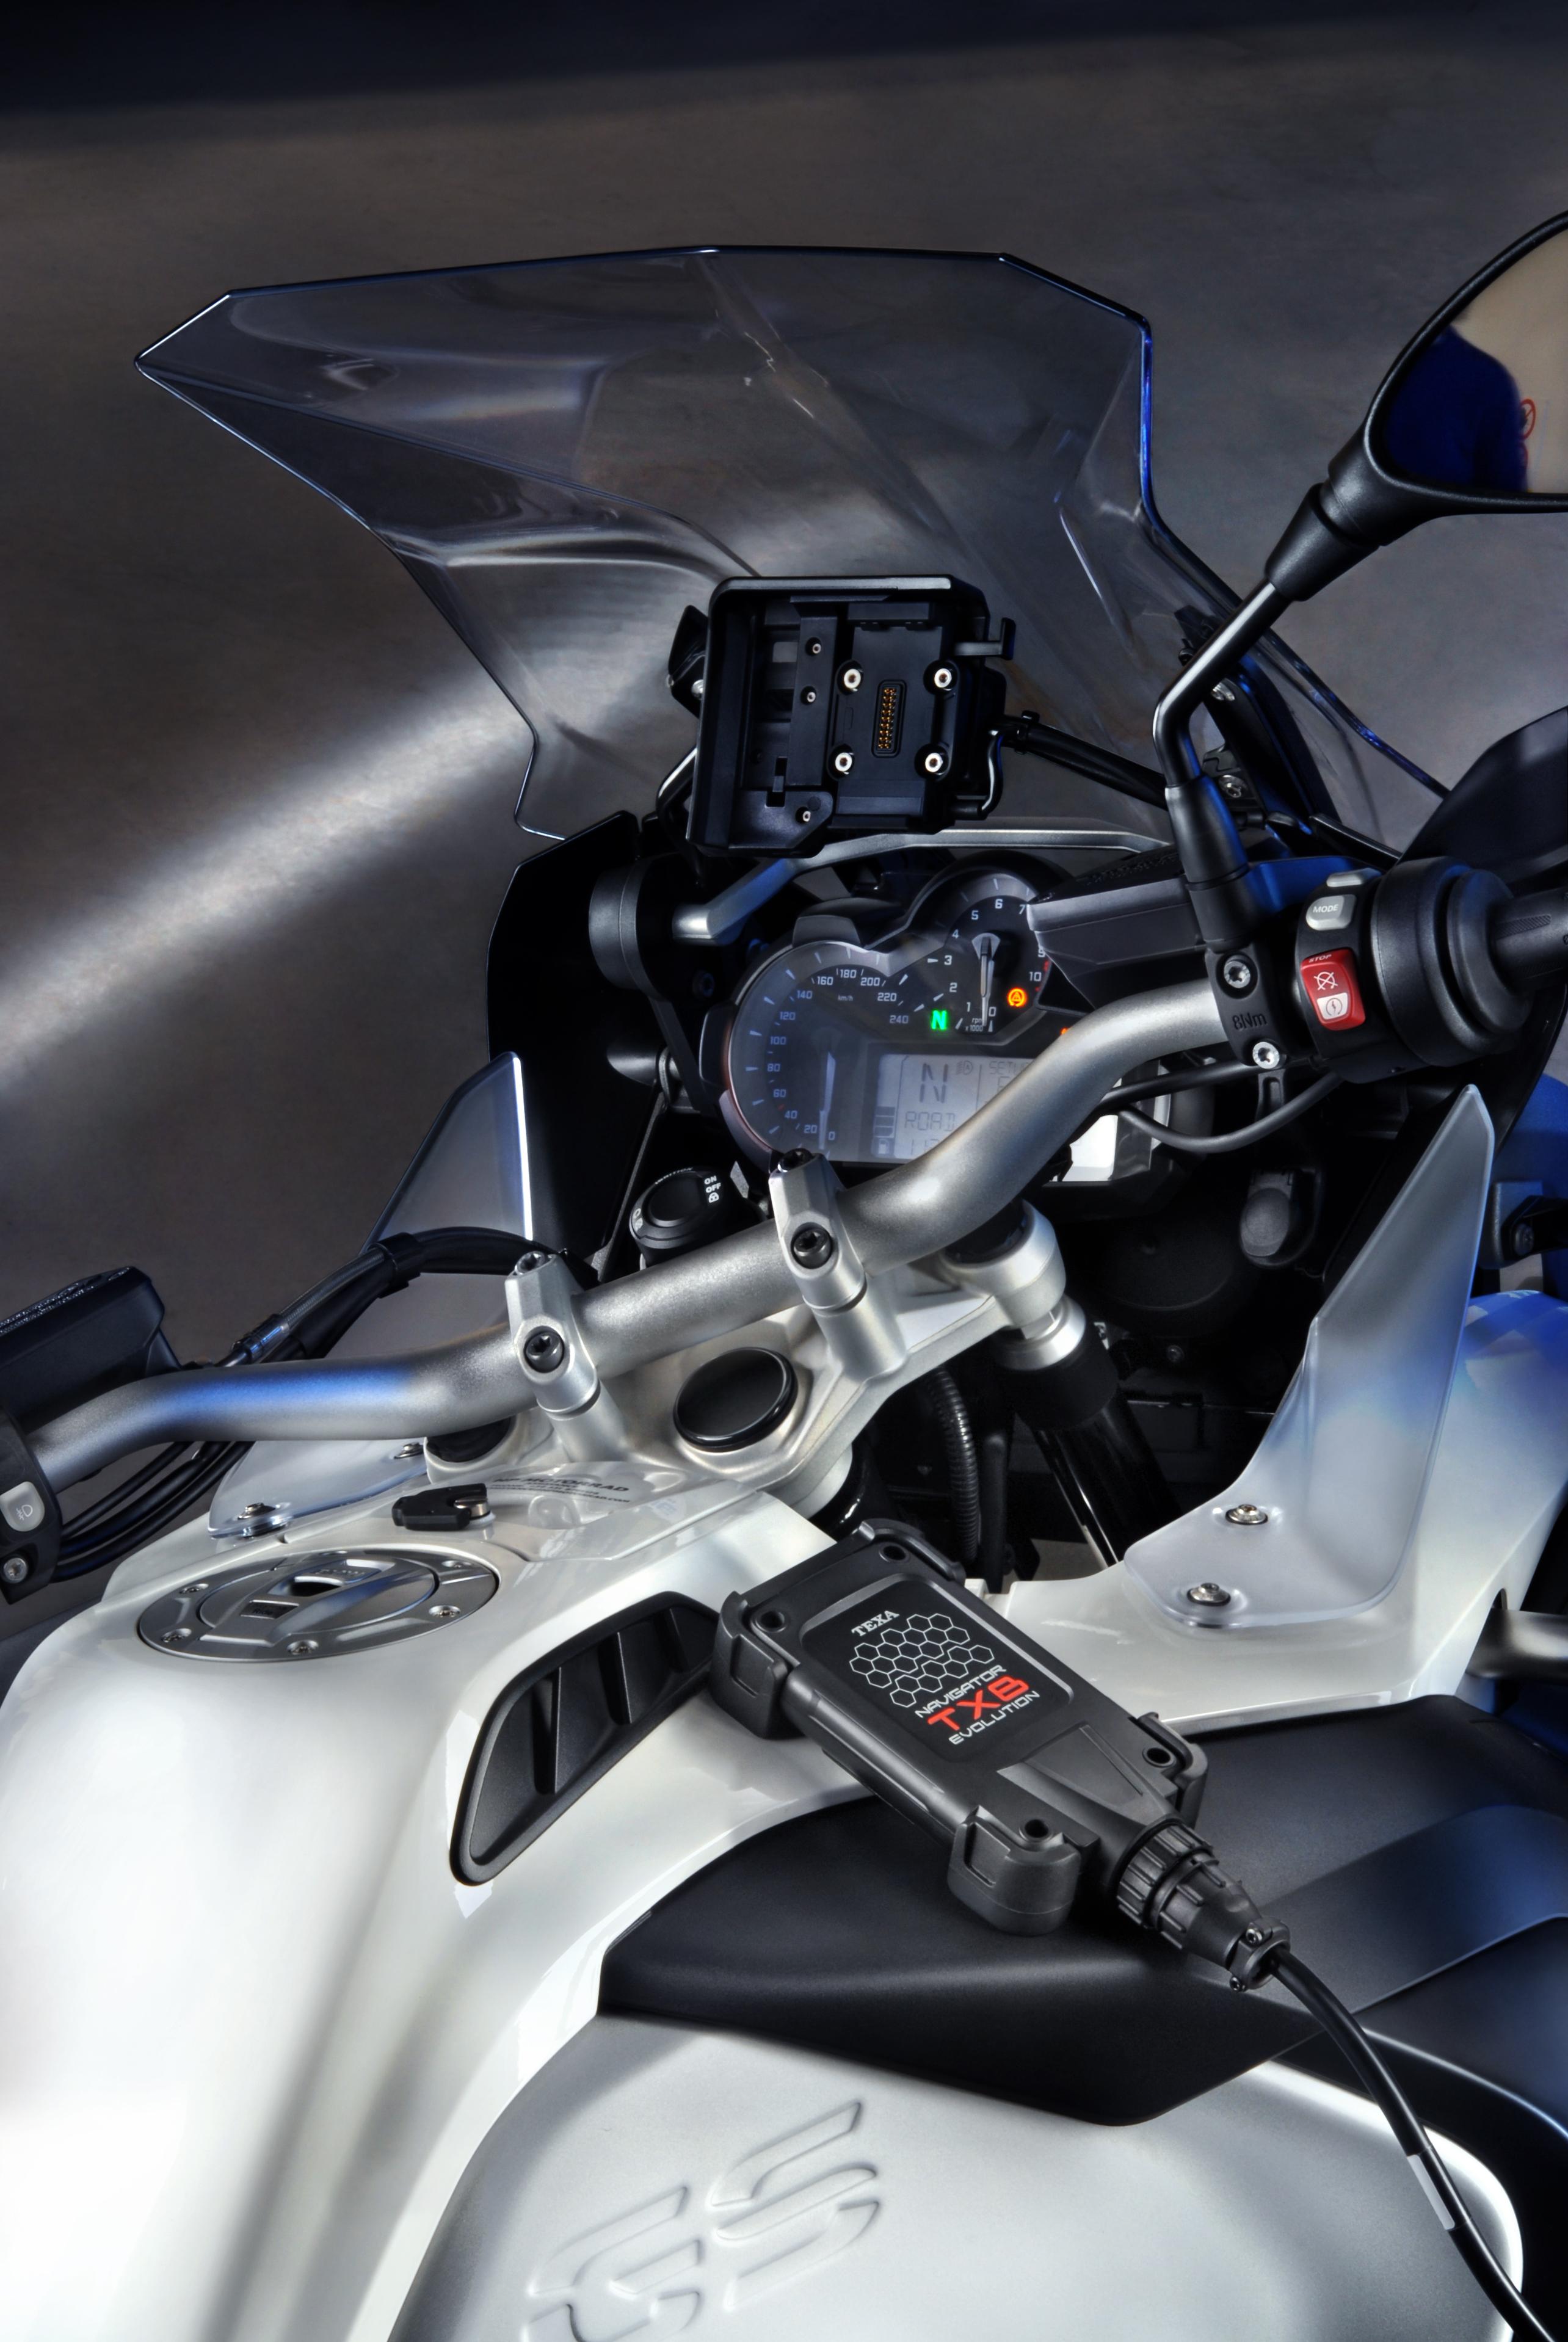 Ongekend Texa TxBe Motorfiets diagnose apparaat voor PC Texa TxB [D11730 IO-45